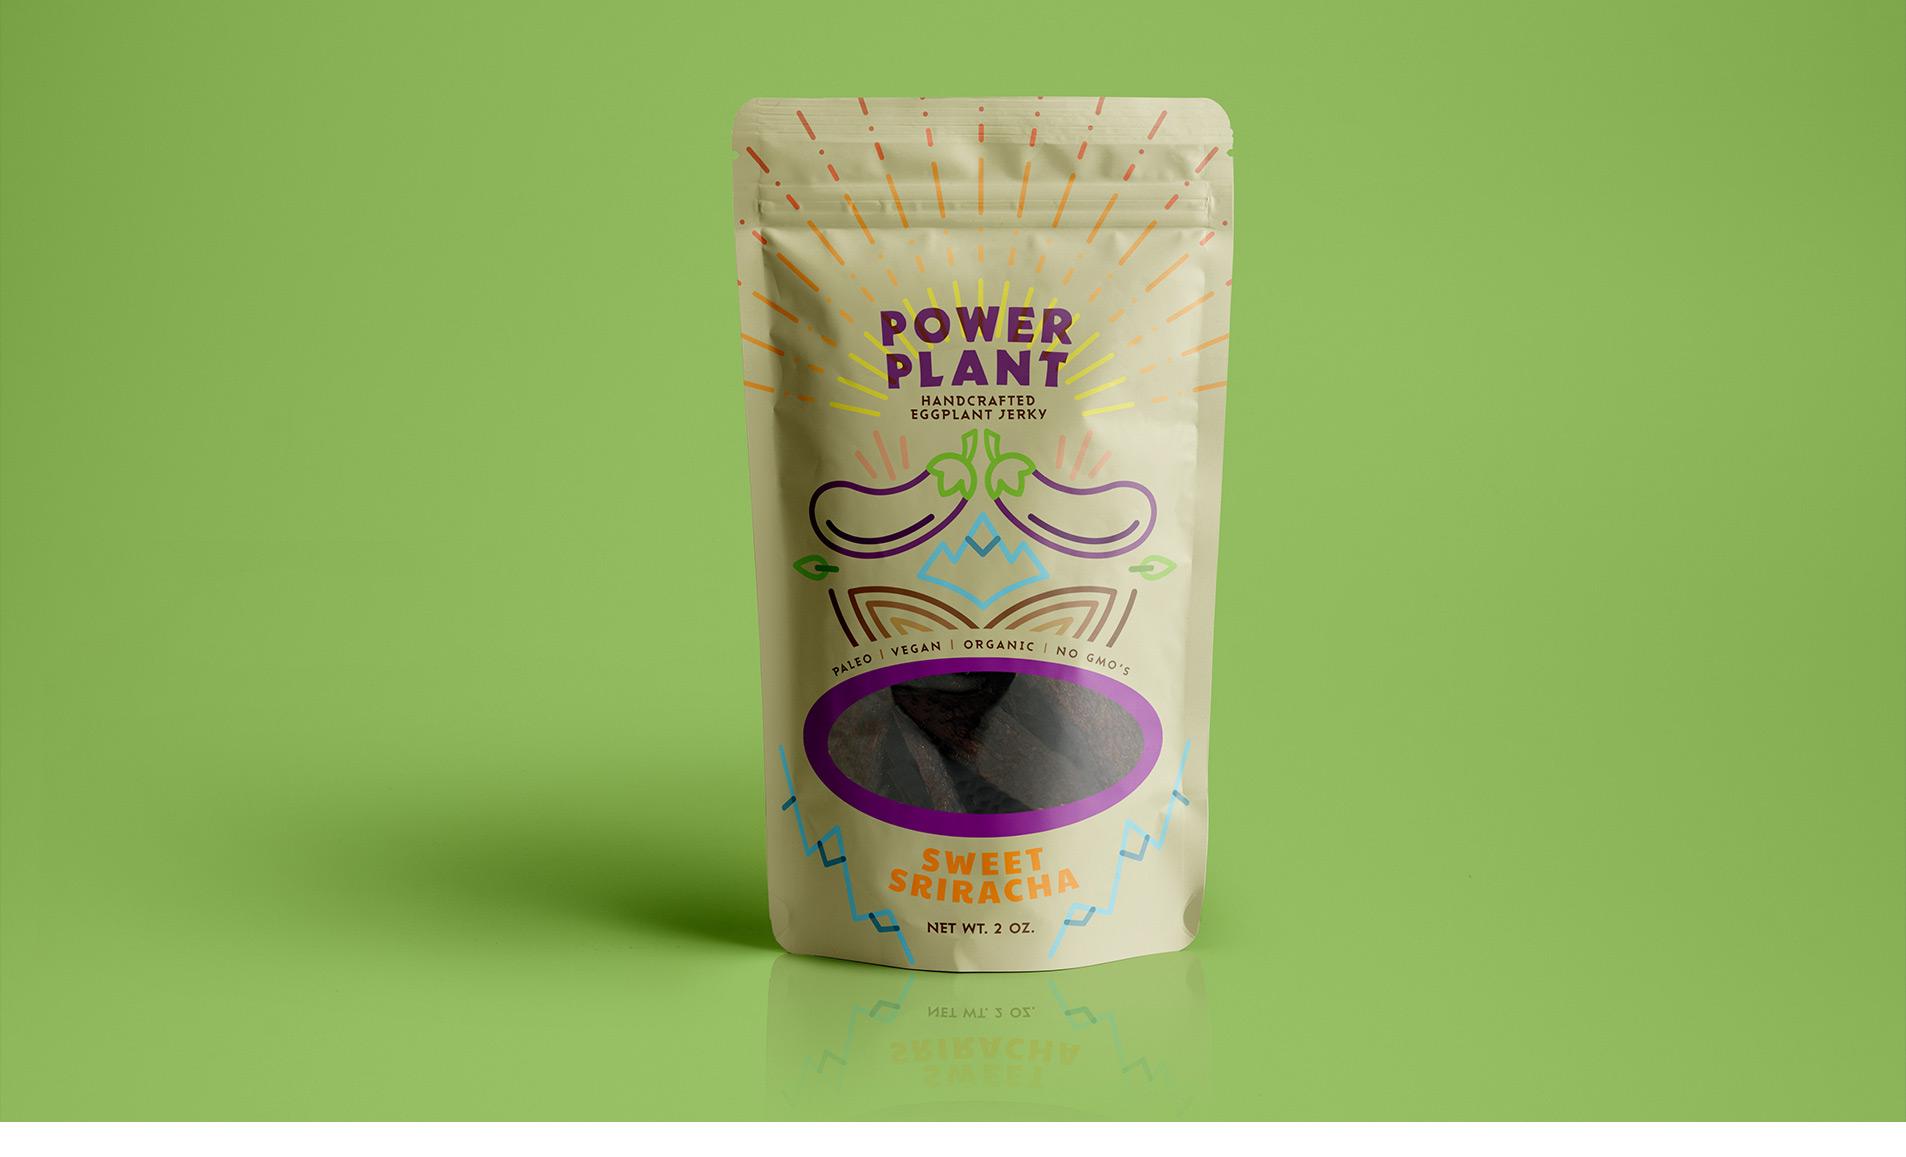 packaging design for eggplant jerky